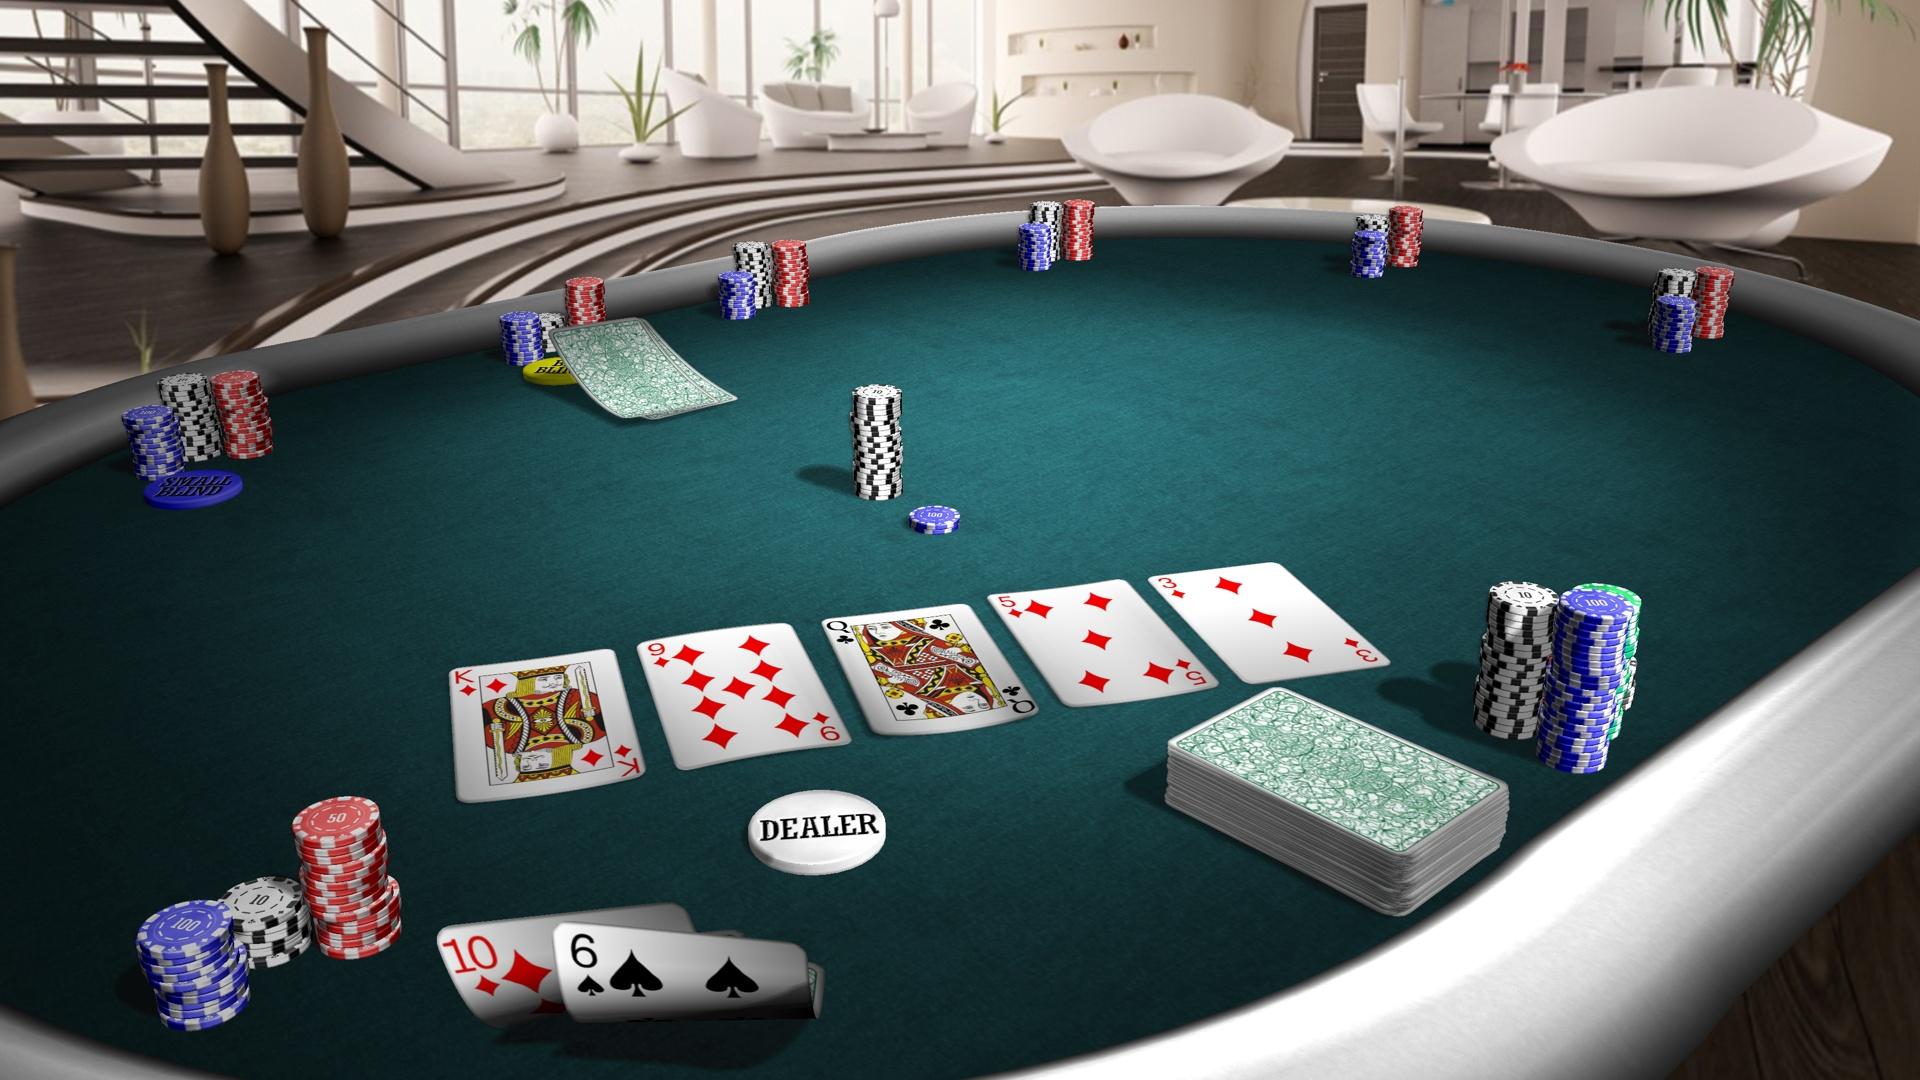 Save 50% on Trendpoker 3D: Texas Hold'em Poker on Steam